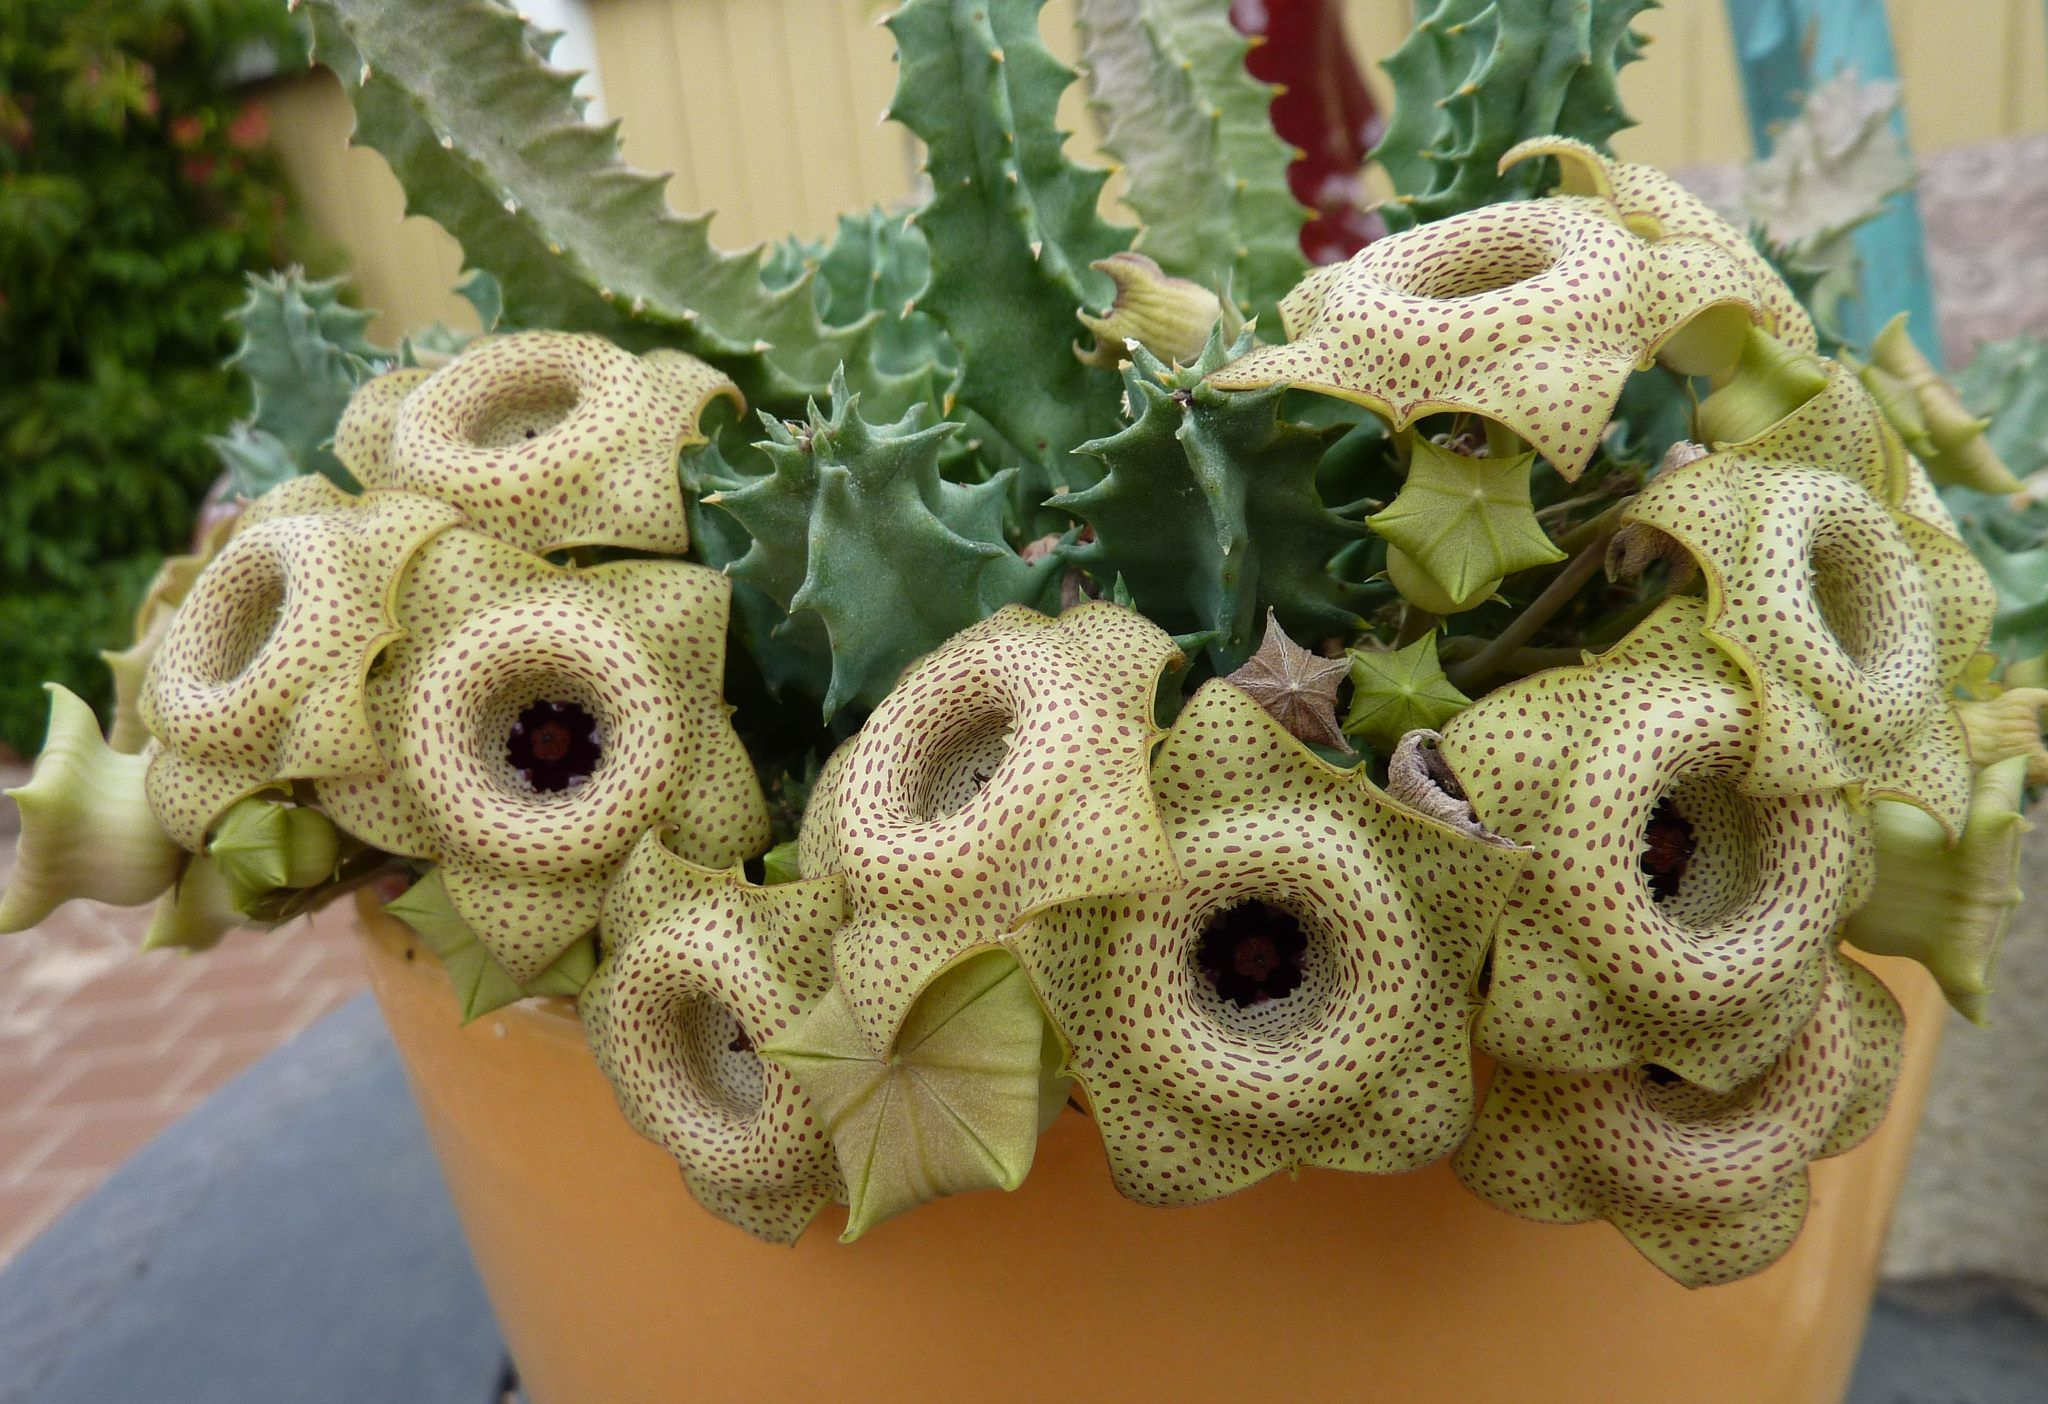 huernia brevirostris succulents pinterest kaktus. Black Bedroom Furniture Sets. Home Design Ideas